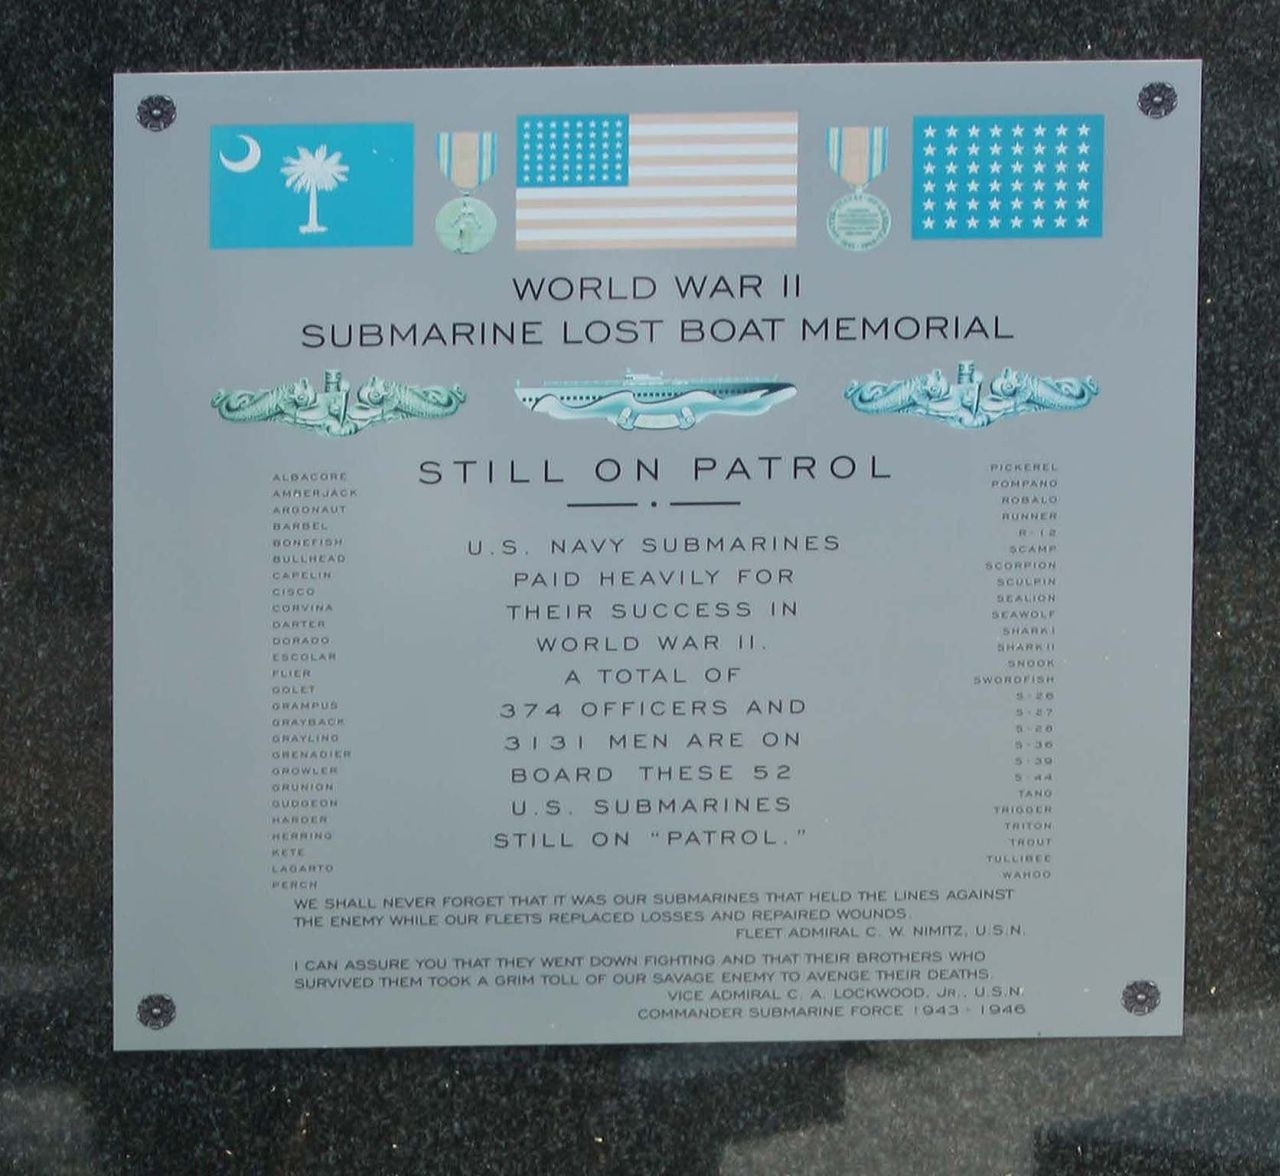 World War II Submarine Lost Boat Memorial Historical Marker